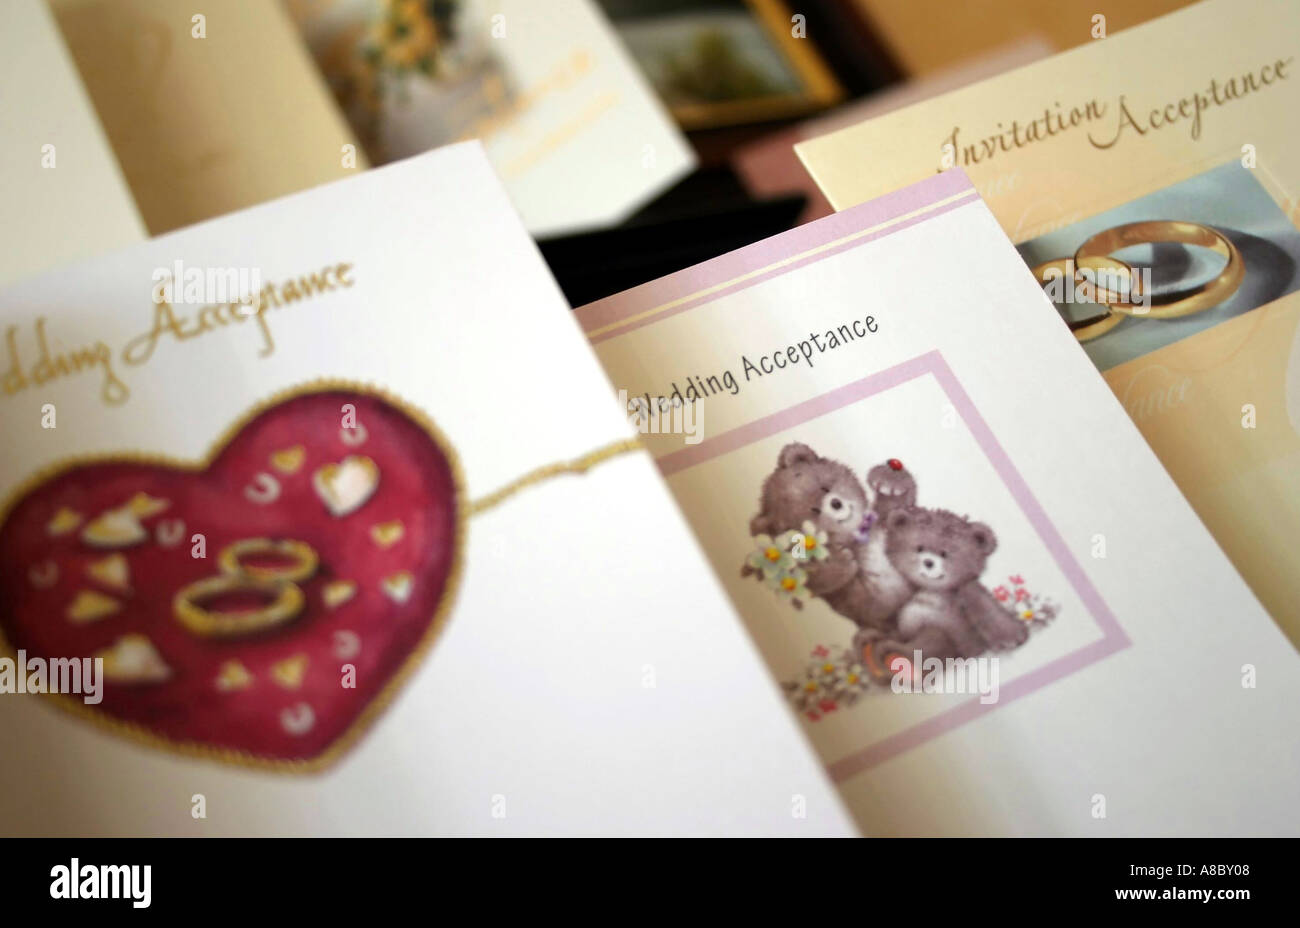 Wedding Acceptance cards on display Stock Photo: 3936007 - Alamy